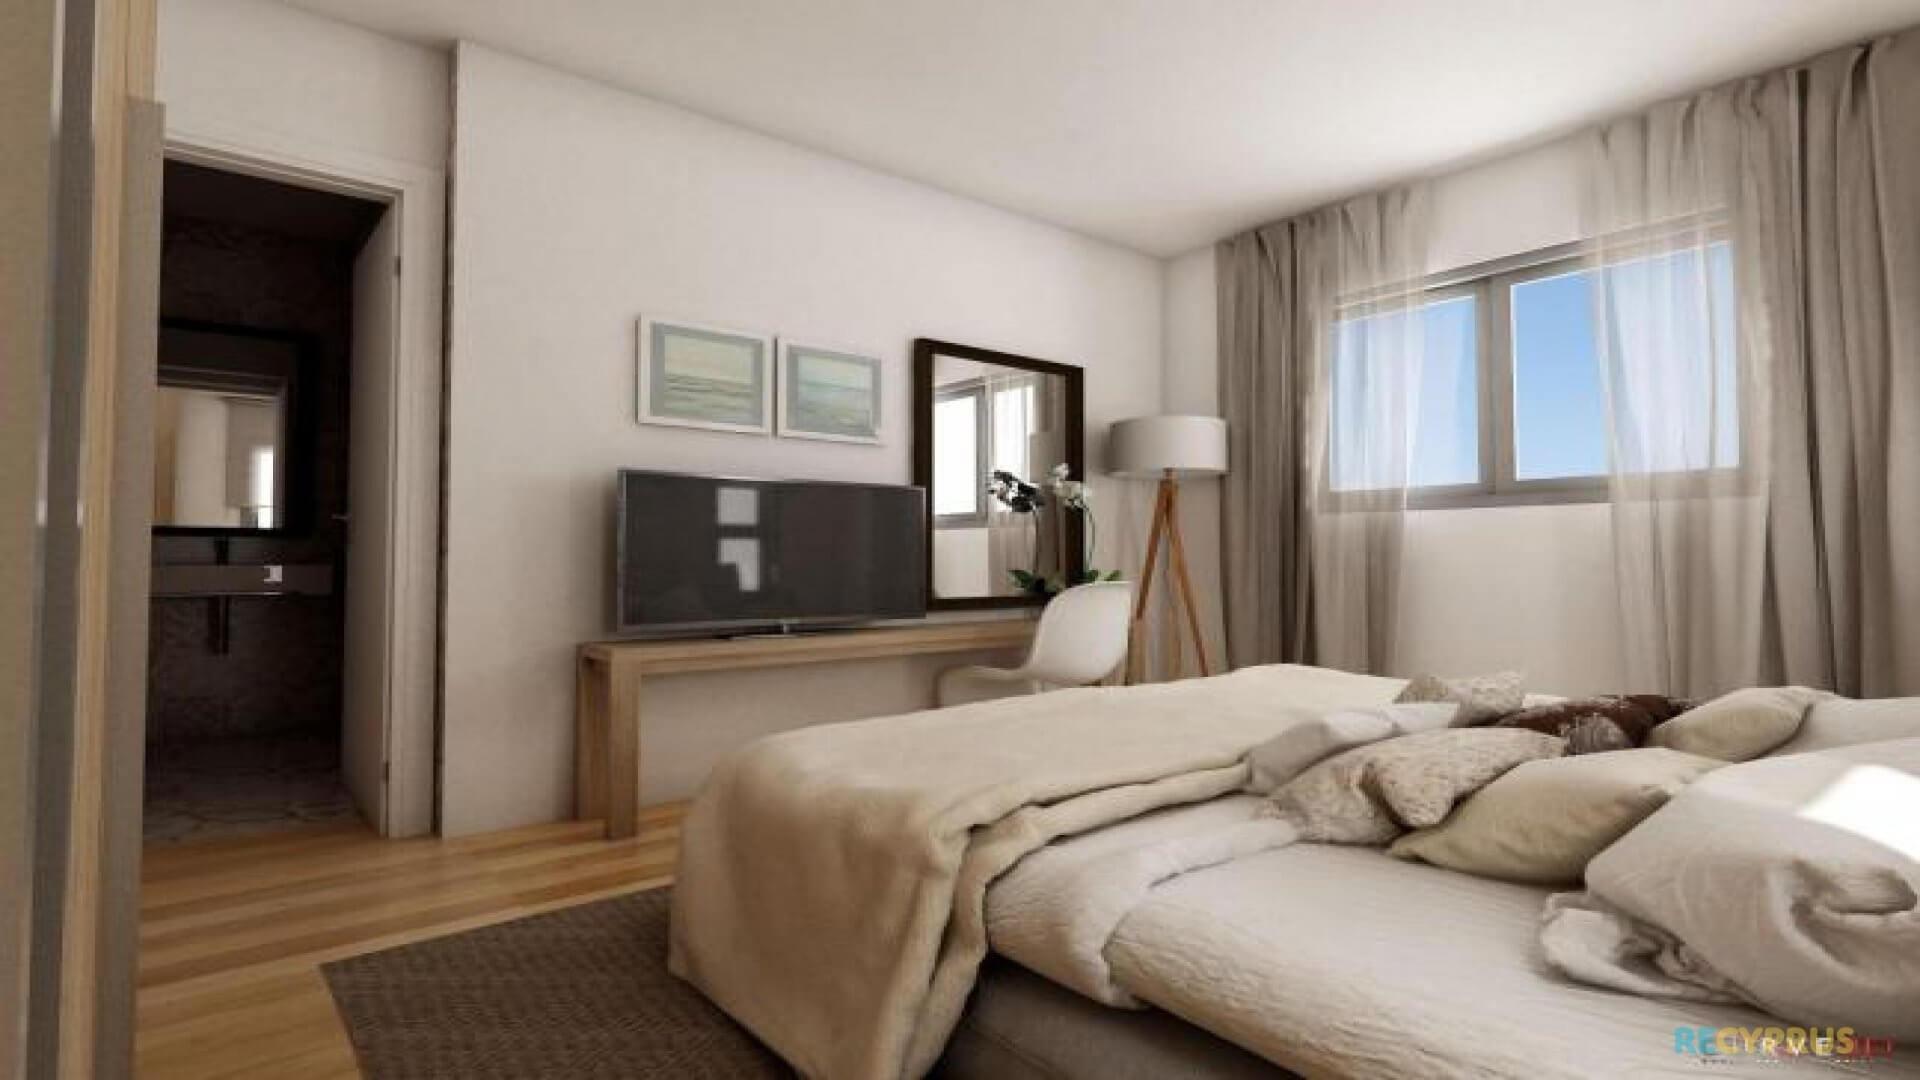 Apartment for sale City Center Larnaca Cyprus 5 3584